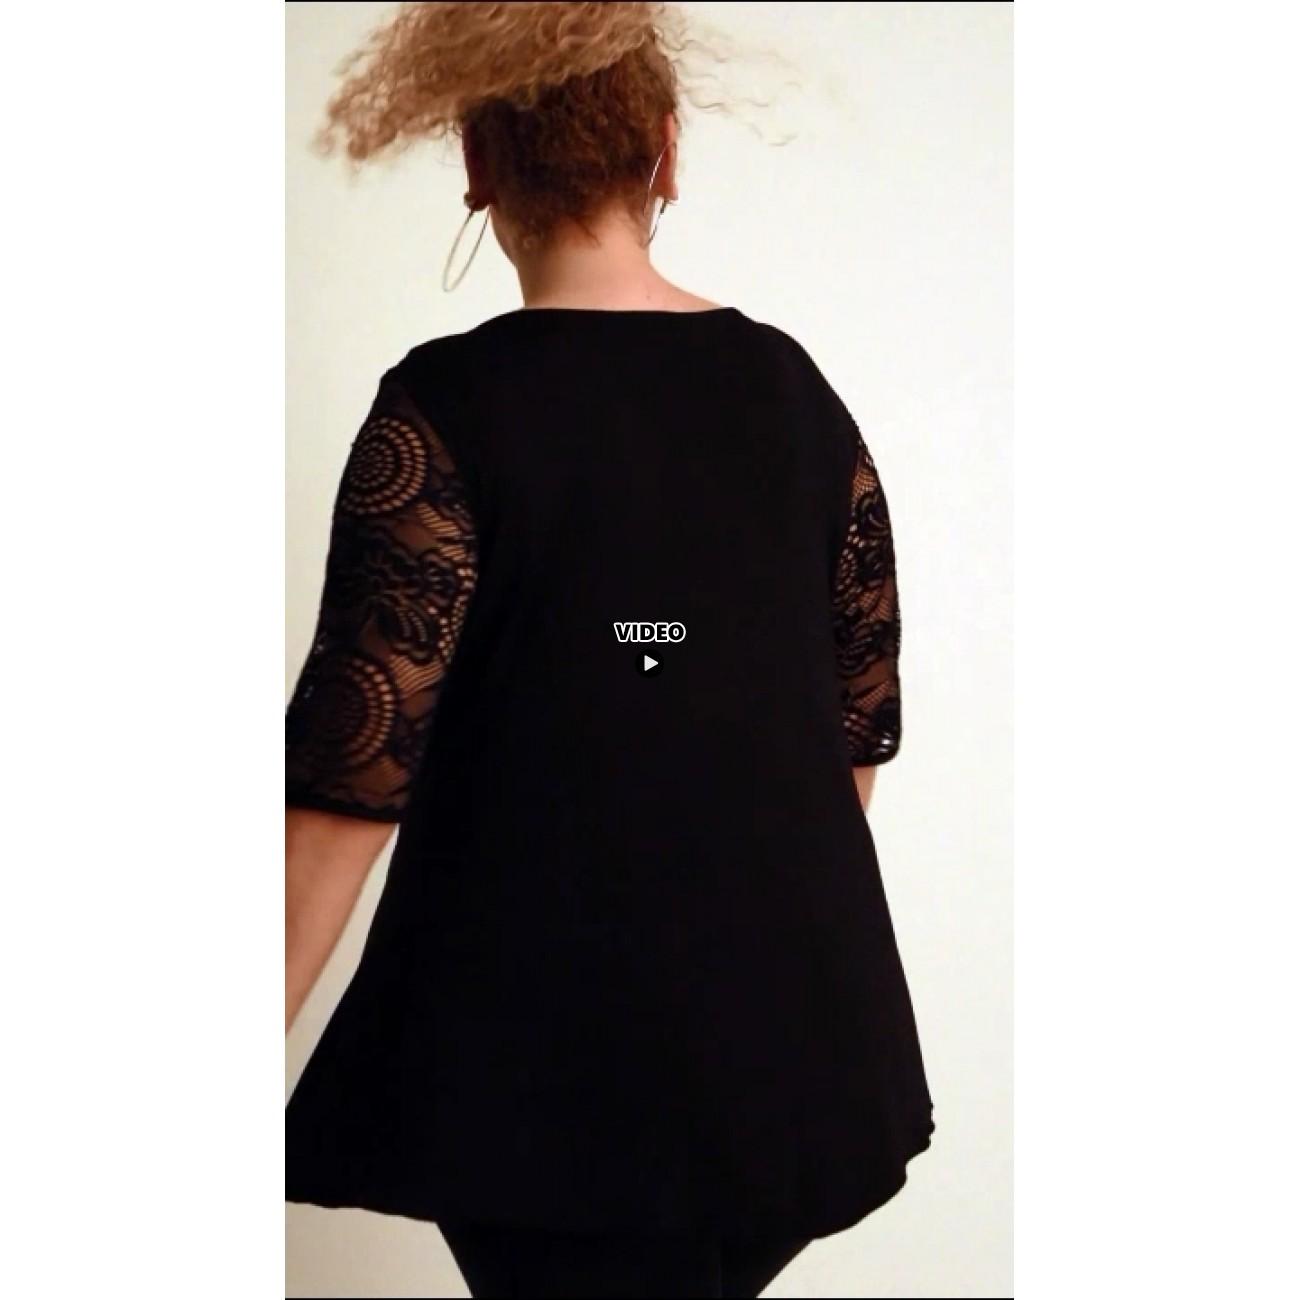 A20-247D Alfa blouse - Turquoise